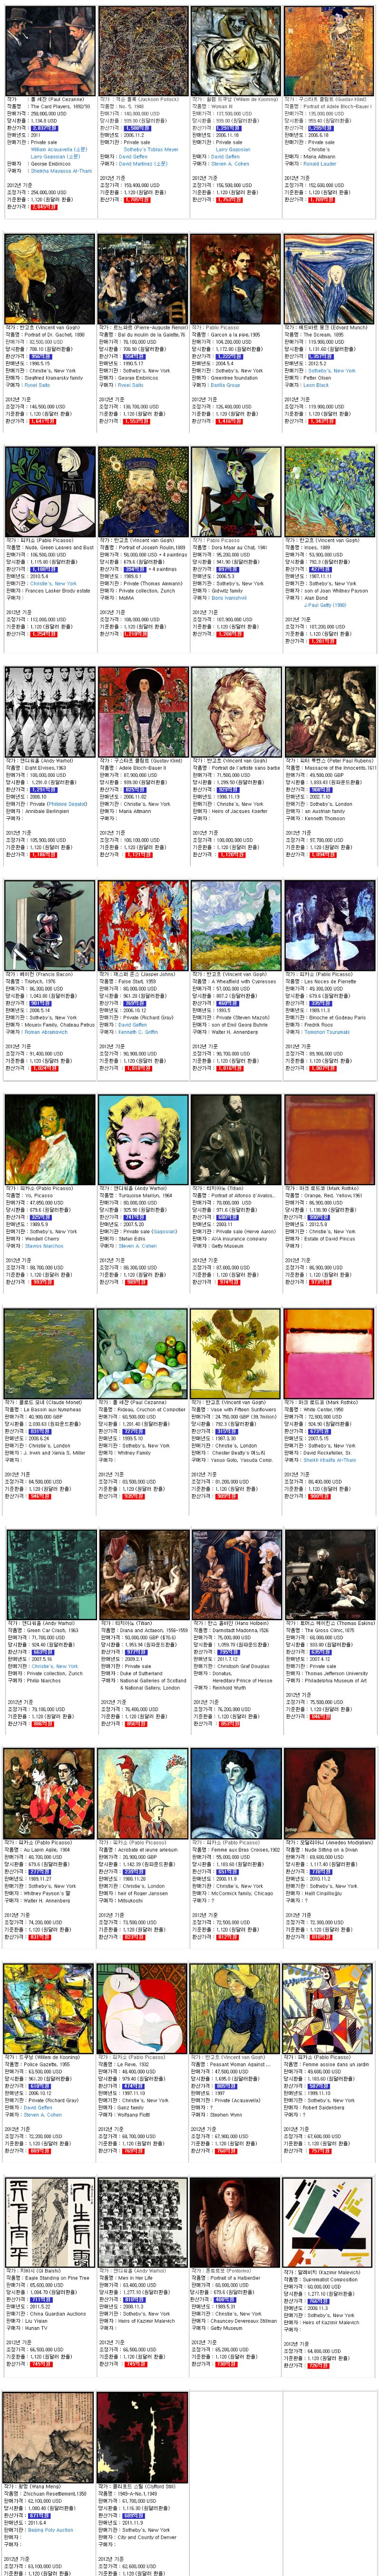 FireShot Screen Capture #005 - '세계 최고가 그림들 _ jpg - 유머' - gongbe_com_drip_524416.jpg